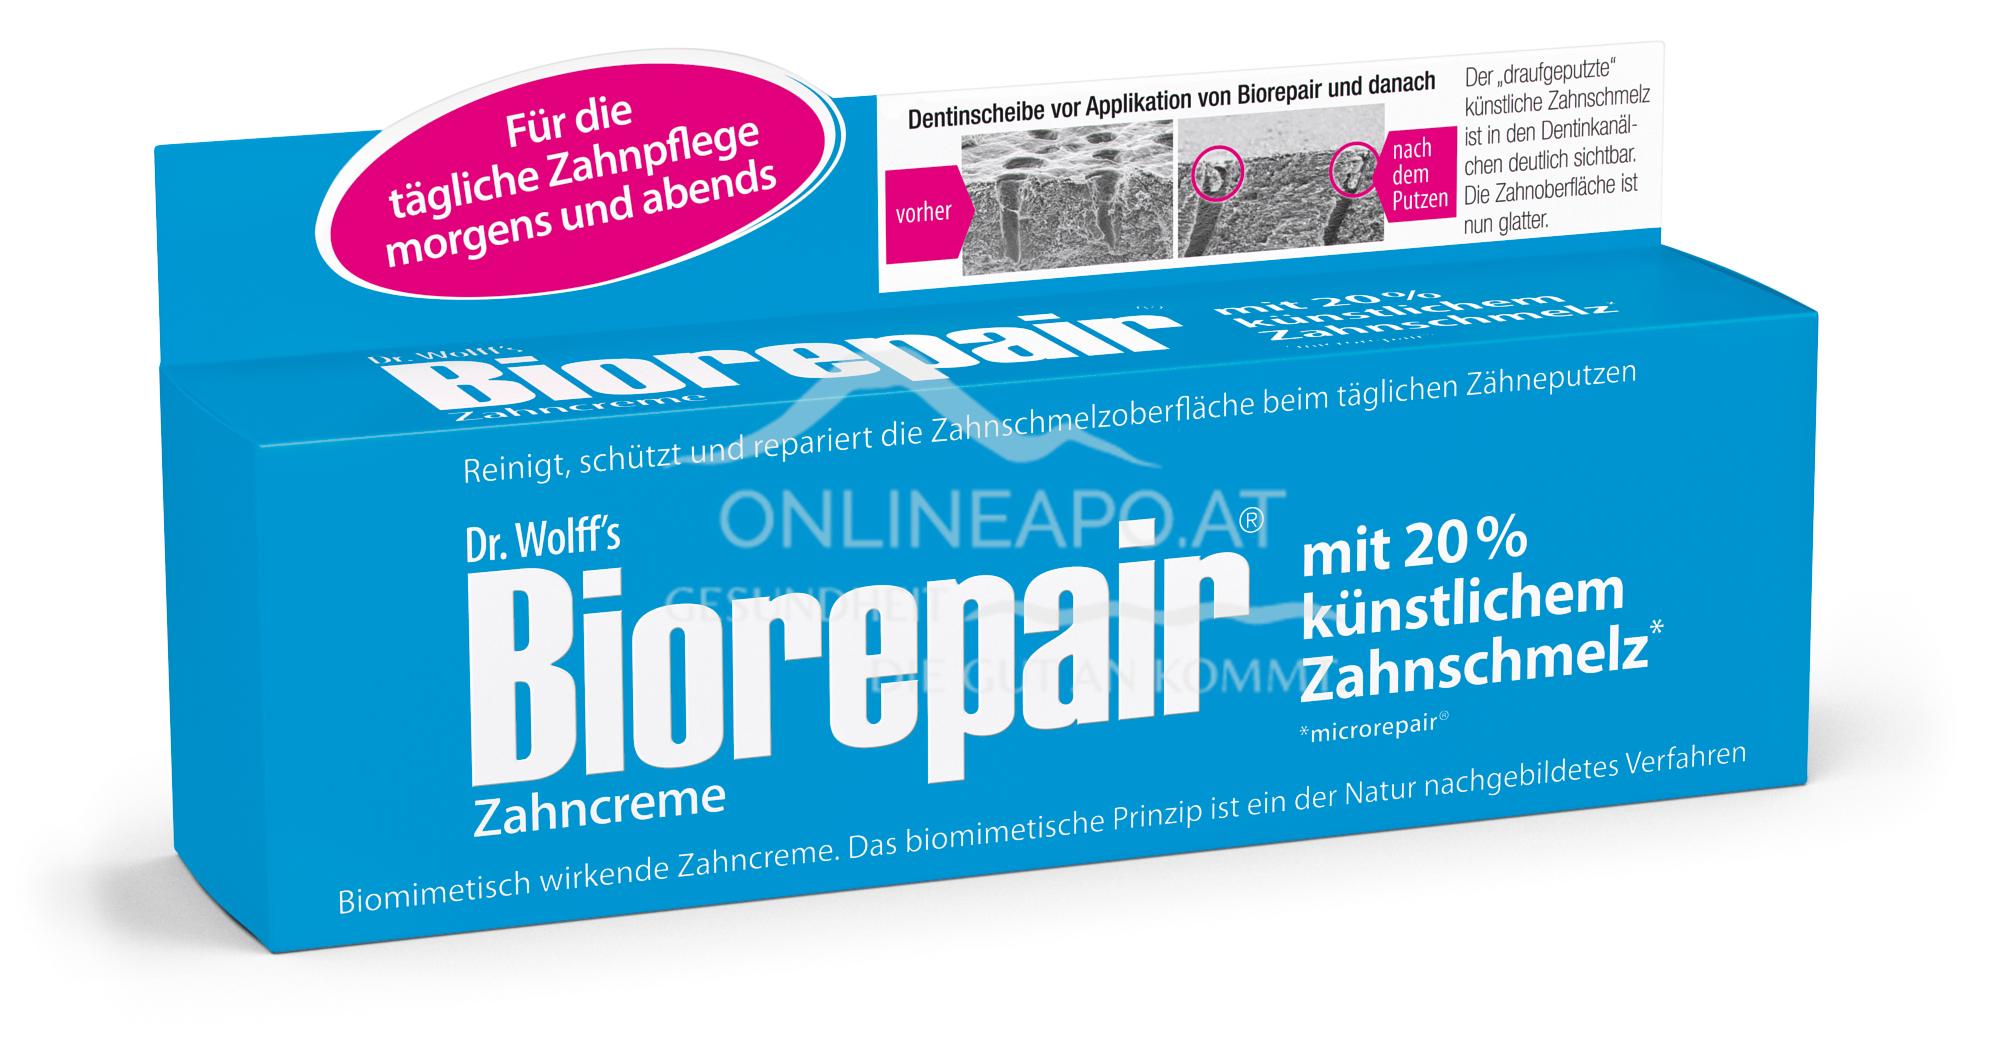 Biorepair® Zahncreme